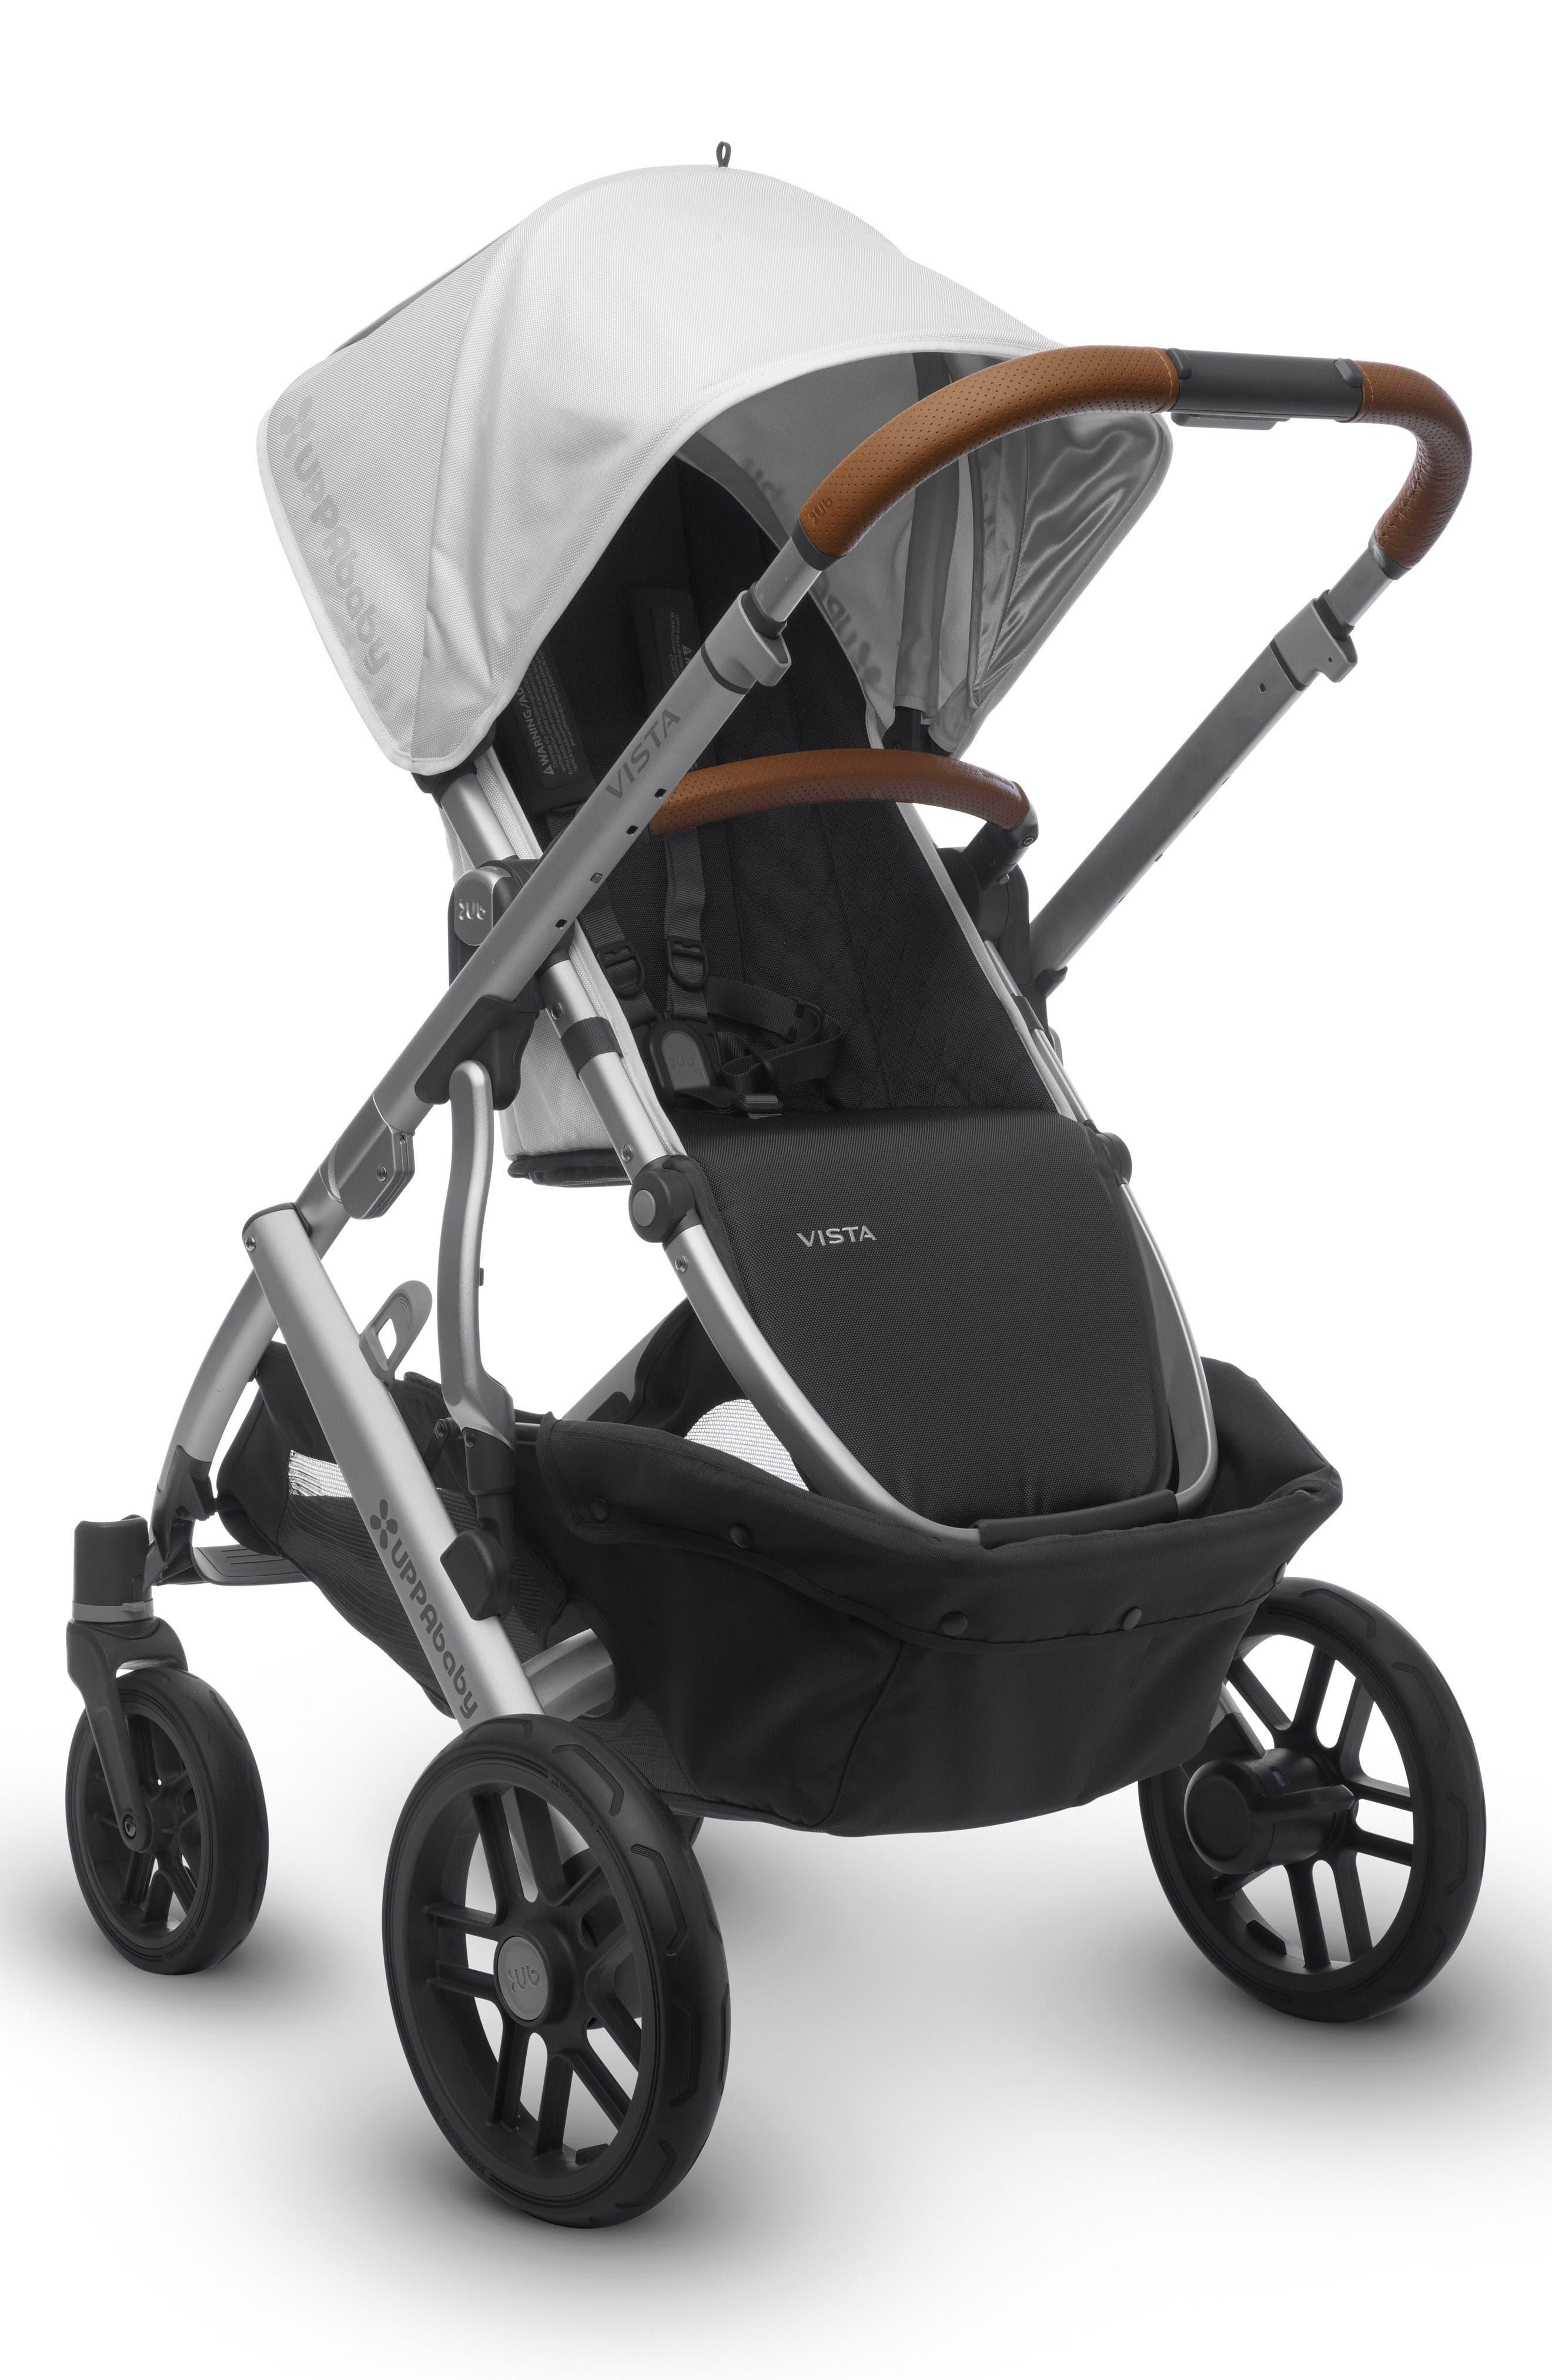 2017 VISTA Aluminum Frame Convertible Stroller with Bassinet & Toddler Seat,                             Alternate thumbnail 3, color,                             White/ Silver